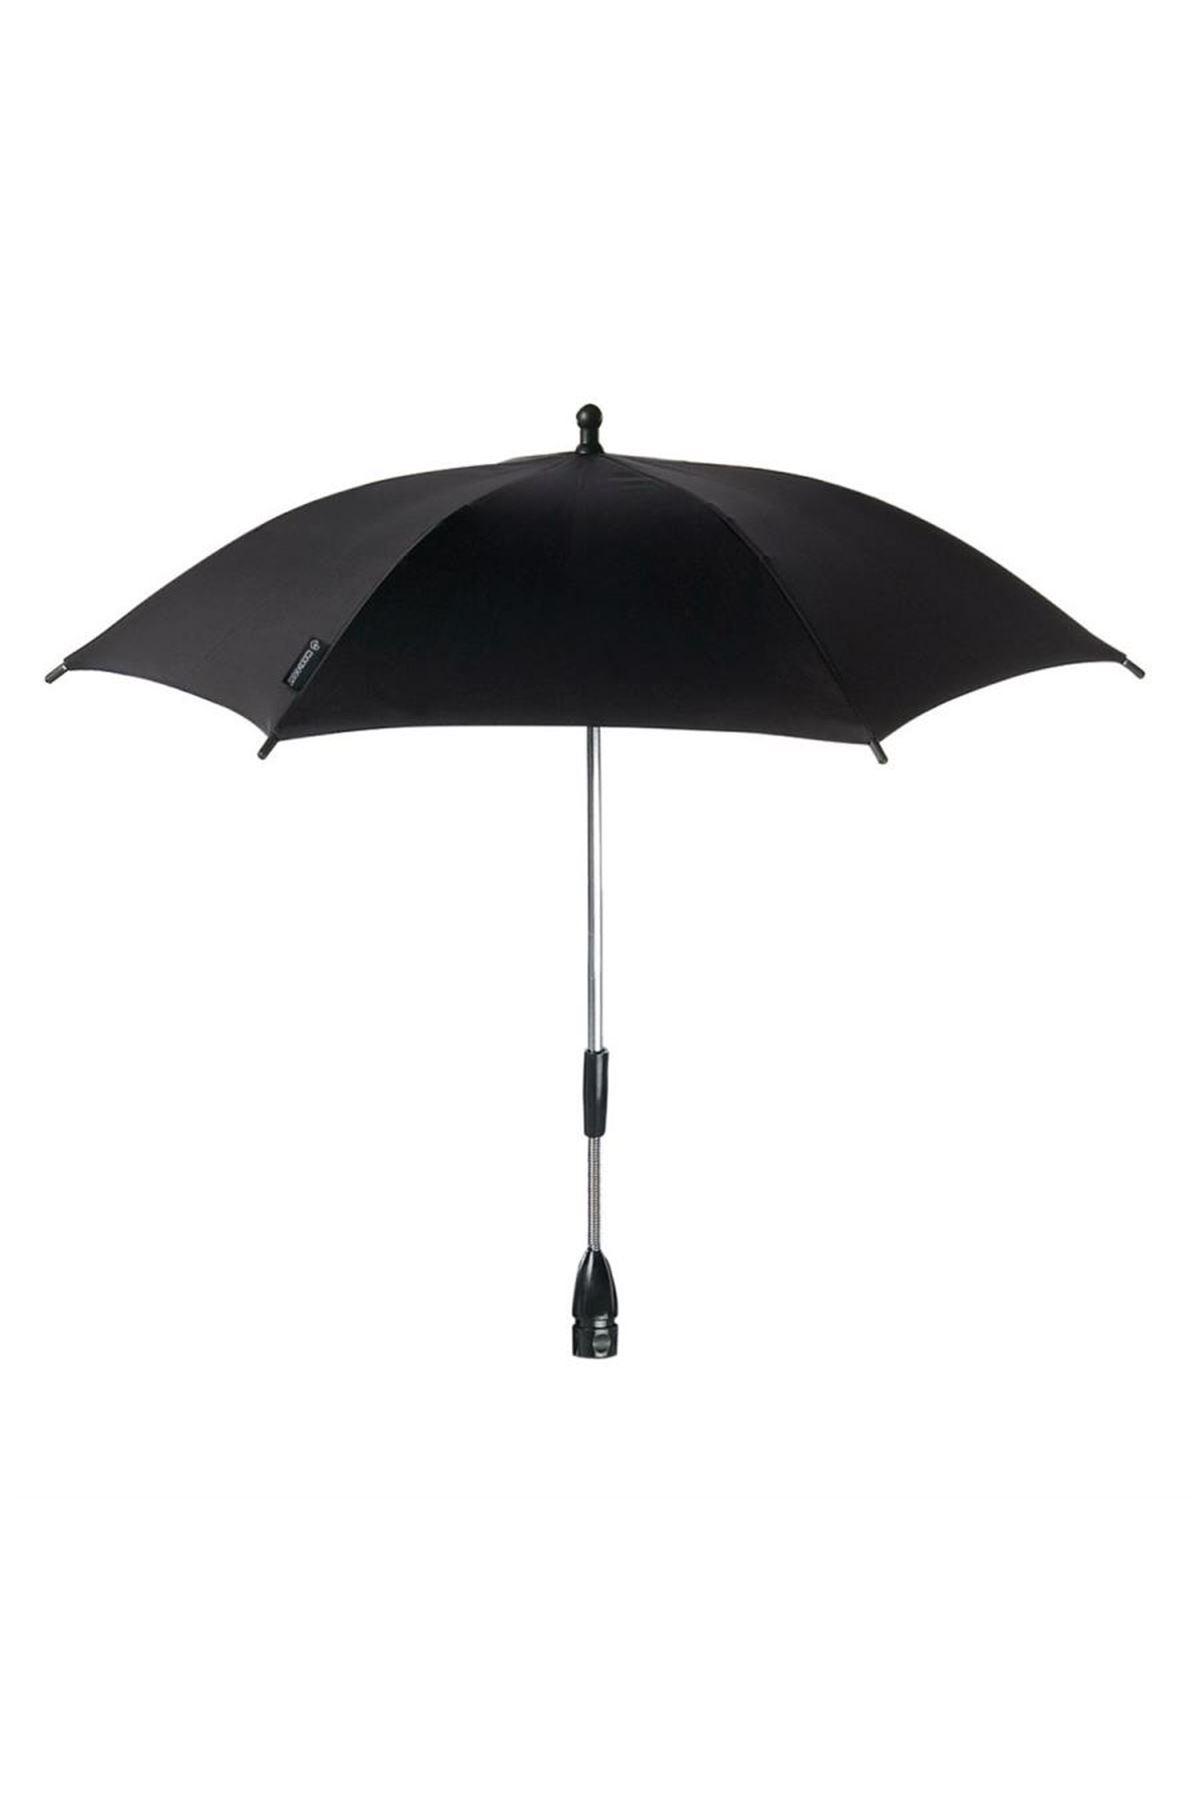 Maxi-Cosi Puset Şemsiyesi / Black Raven